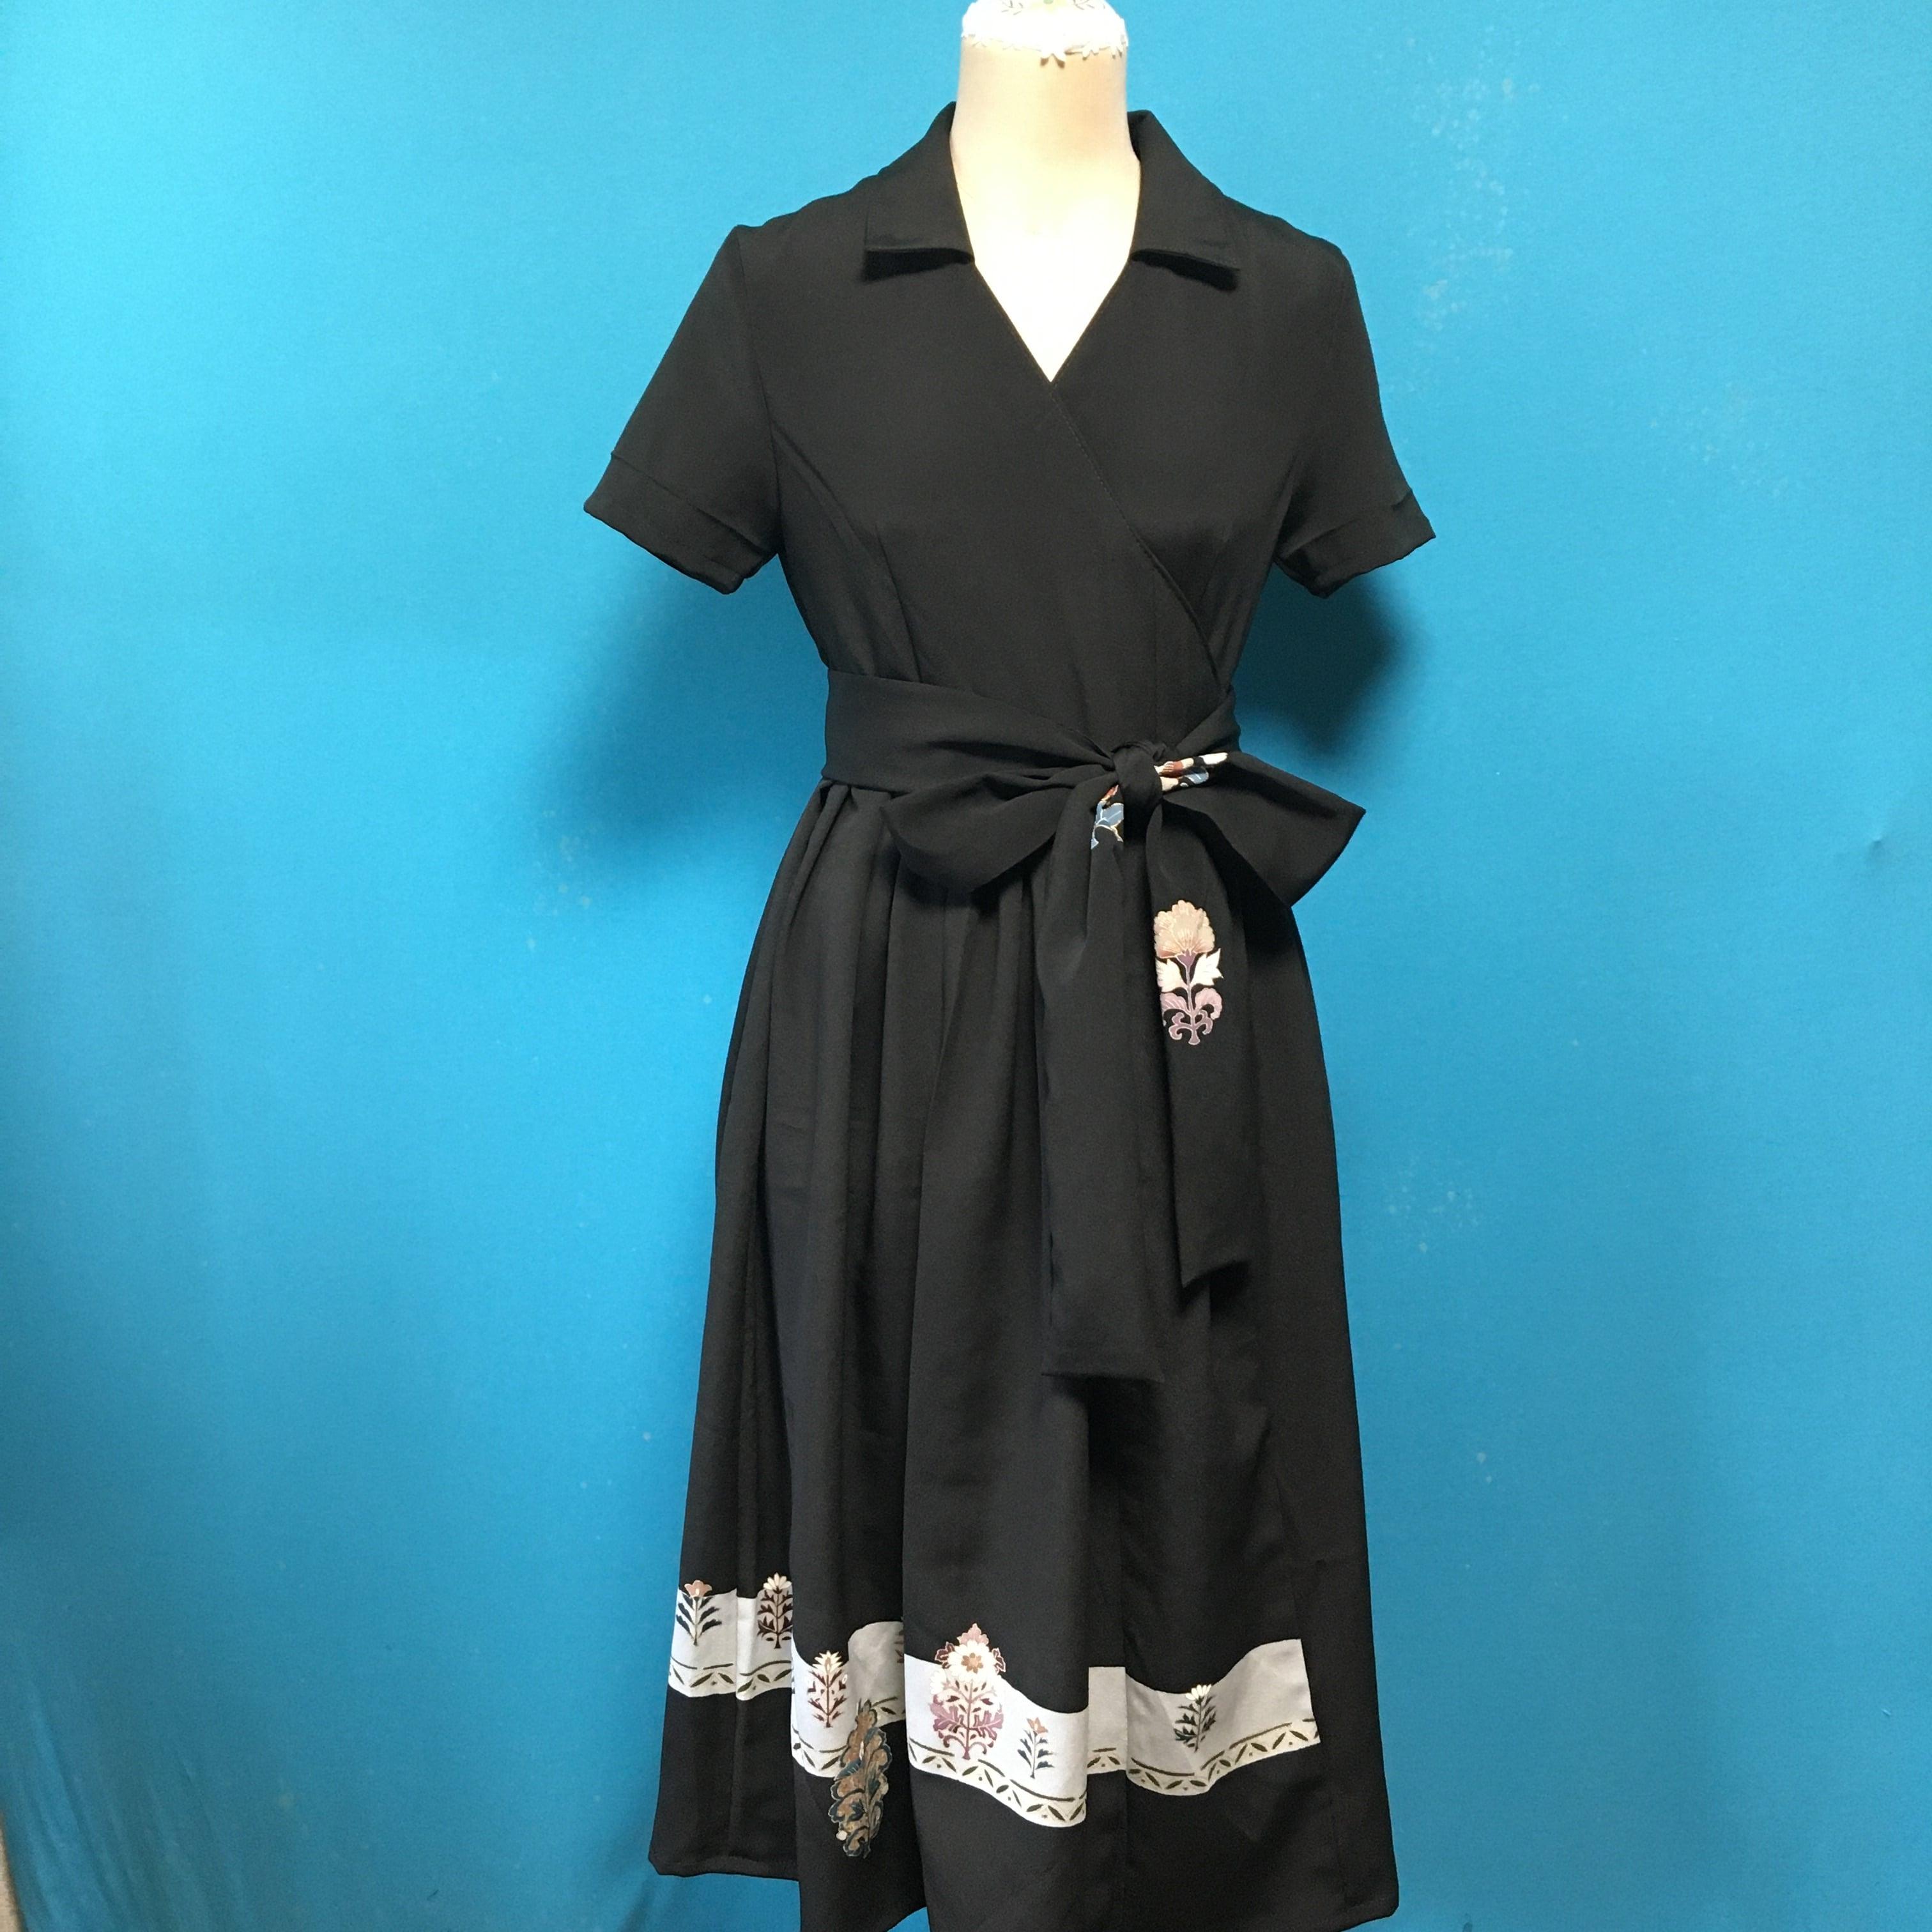 Vintage black dress 古典刺繍更紗